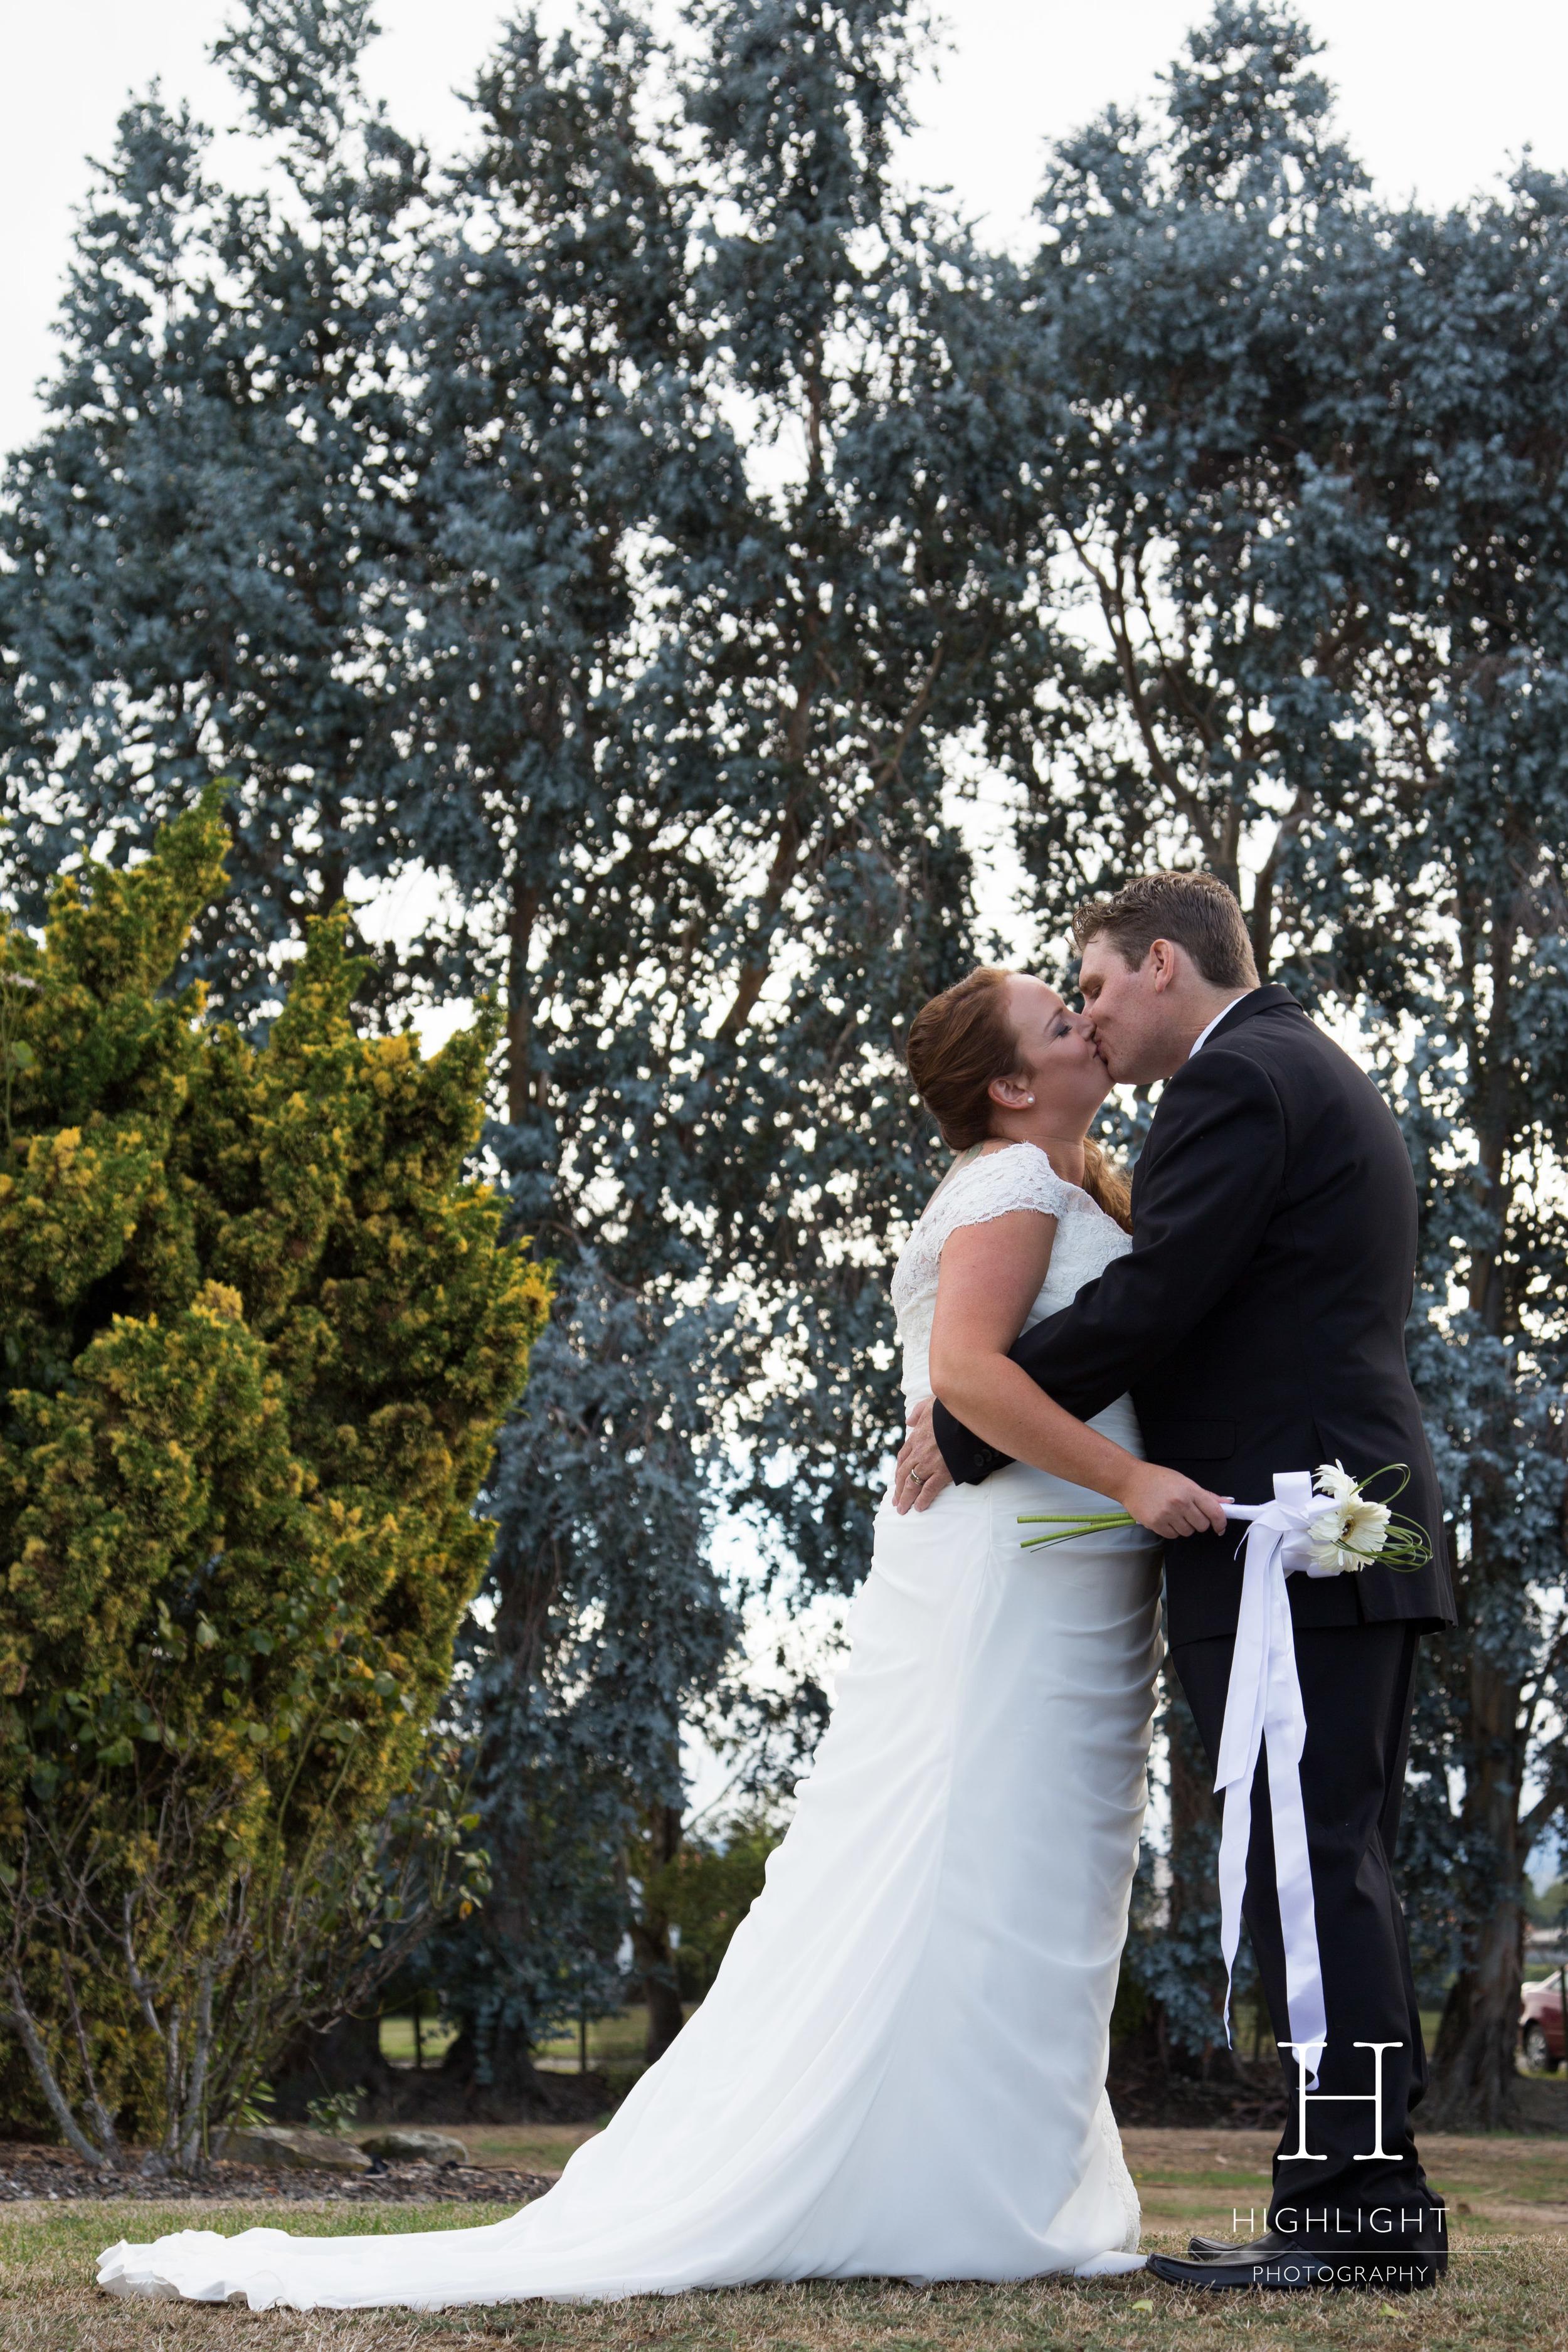 highlight_wedding_photography_masterton.jpg